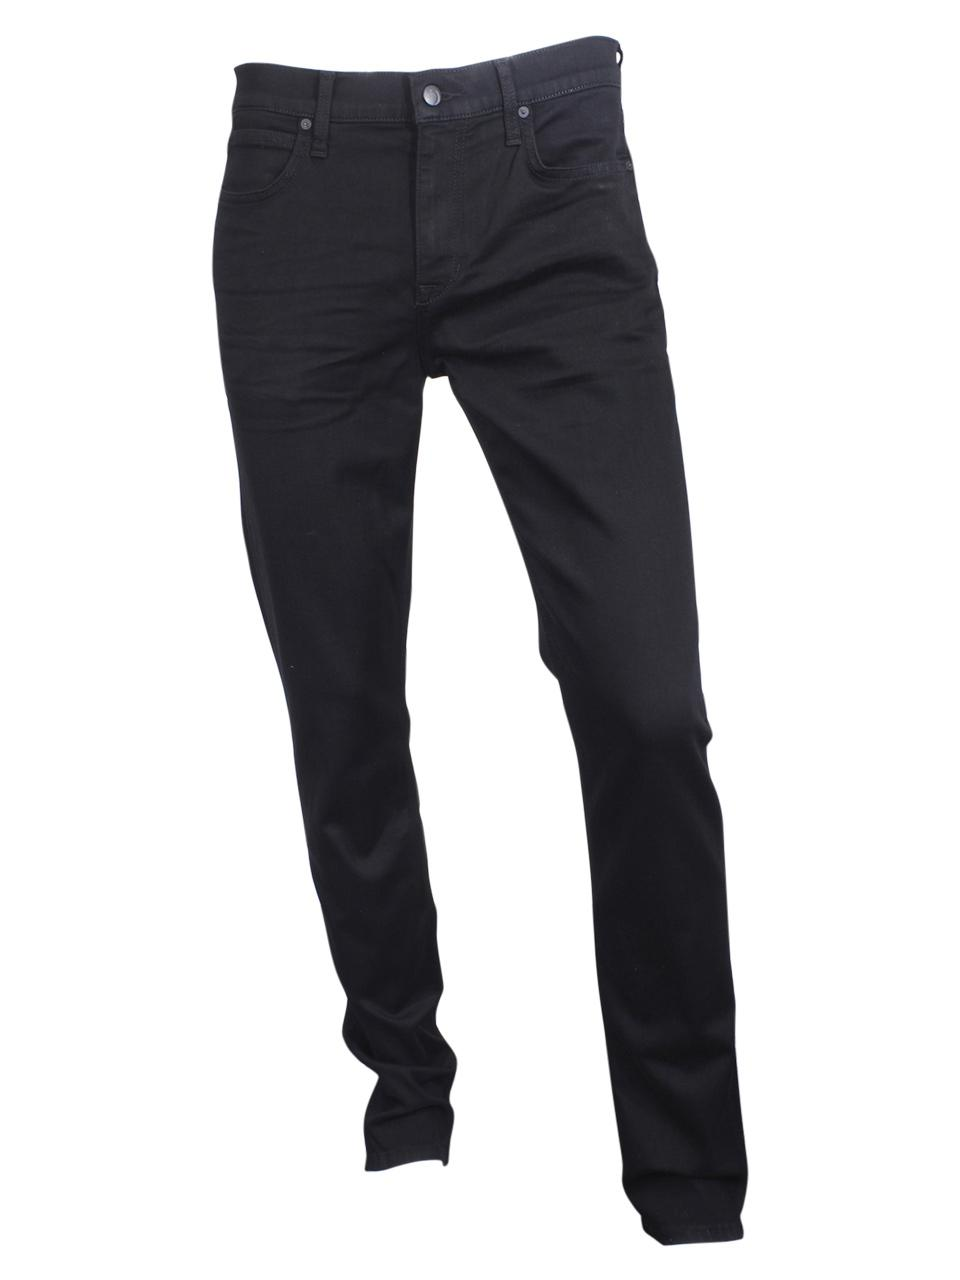 Image of Joe's Jeans Men's The Brixton Kinetic Straight + Narrow Jeans - Black - 31x34